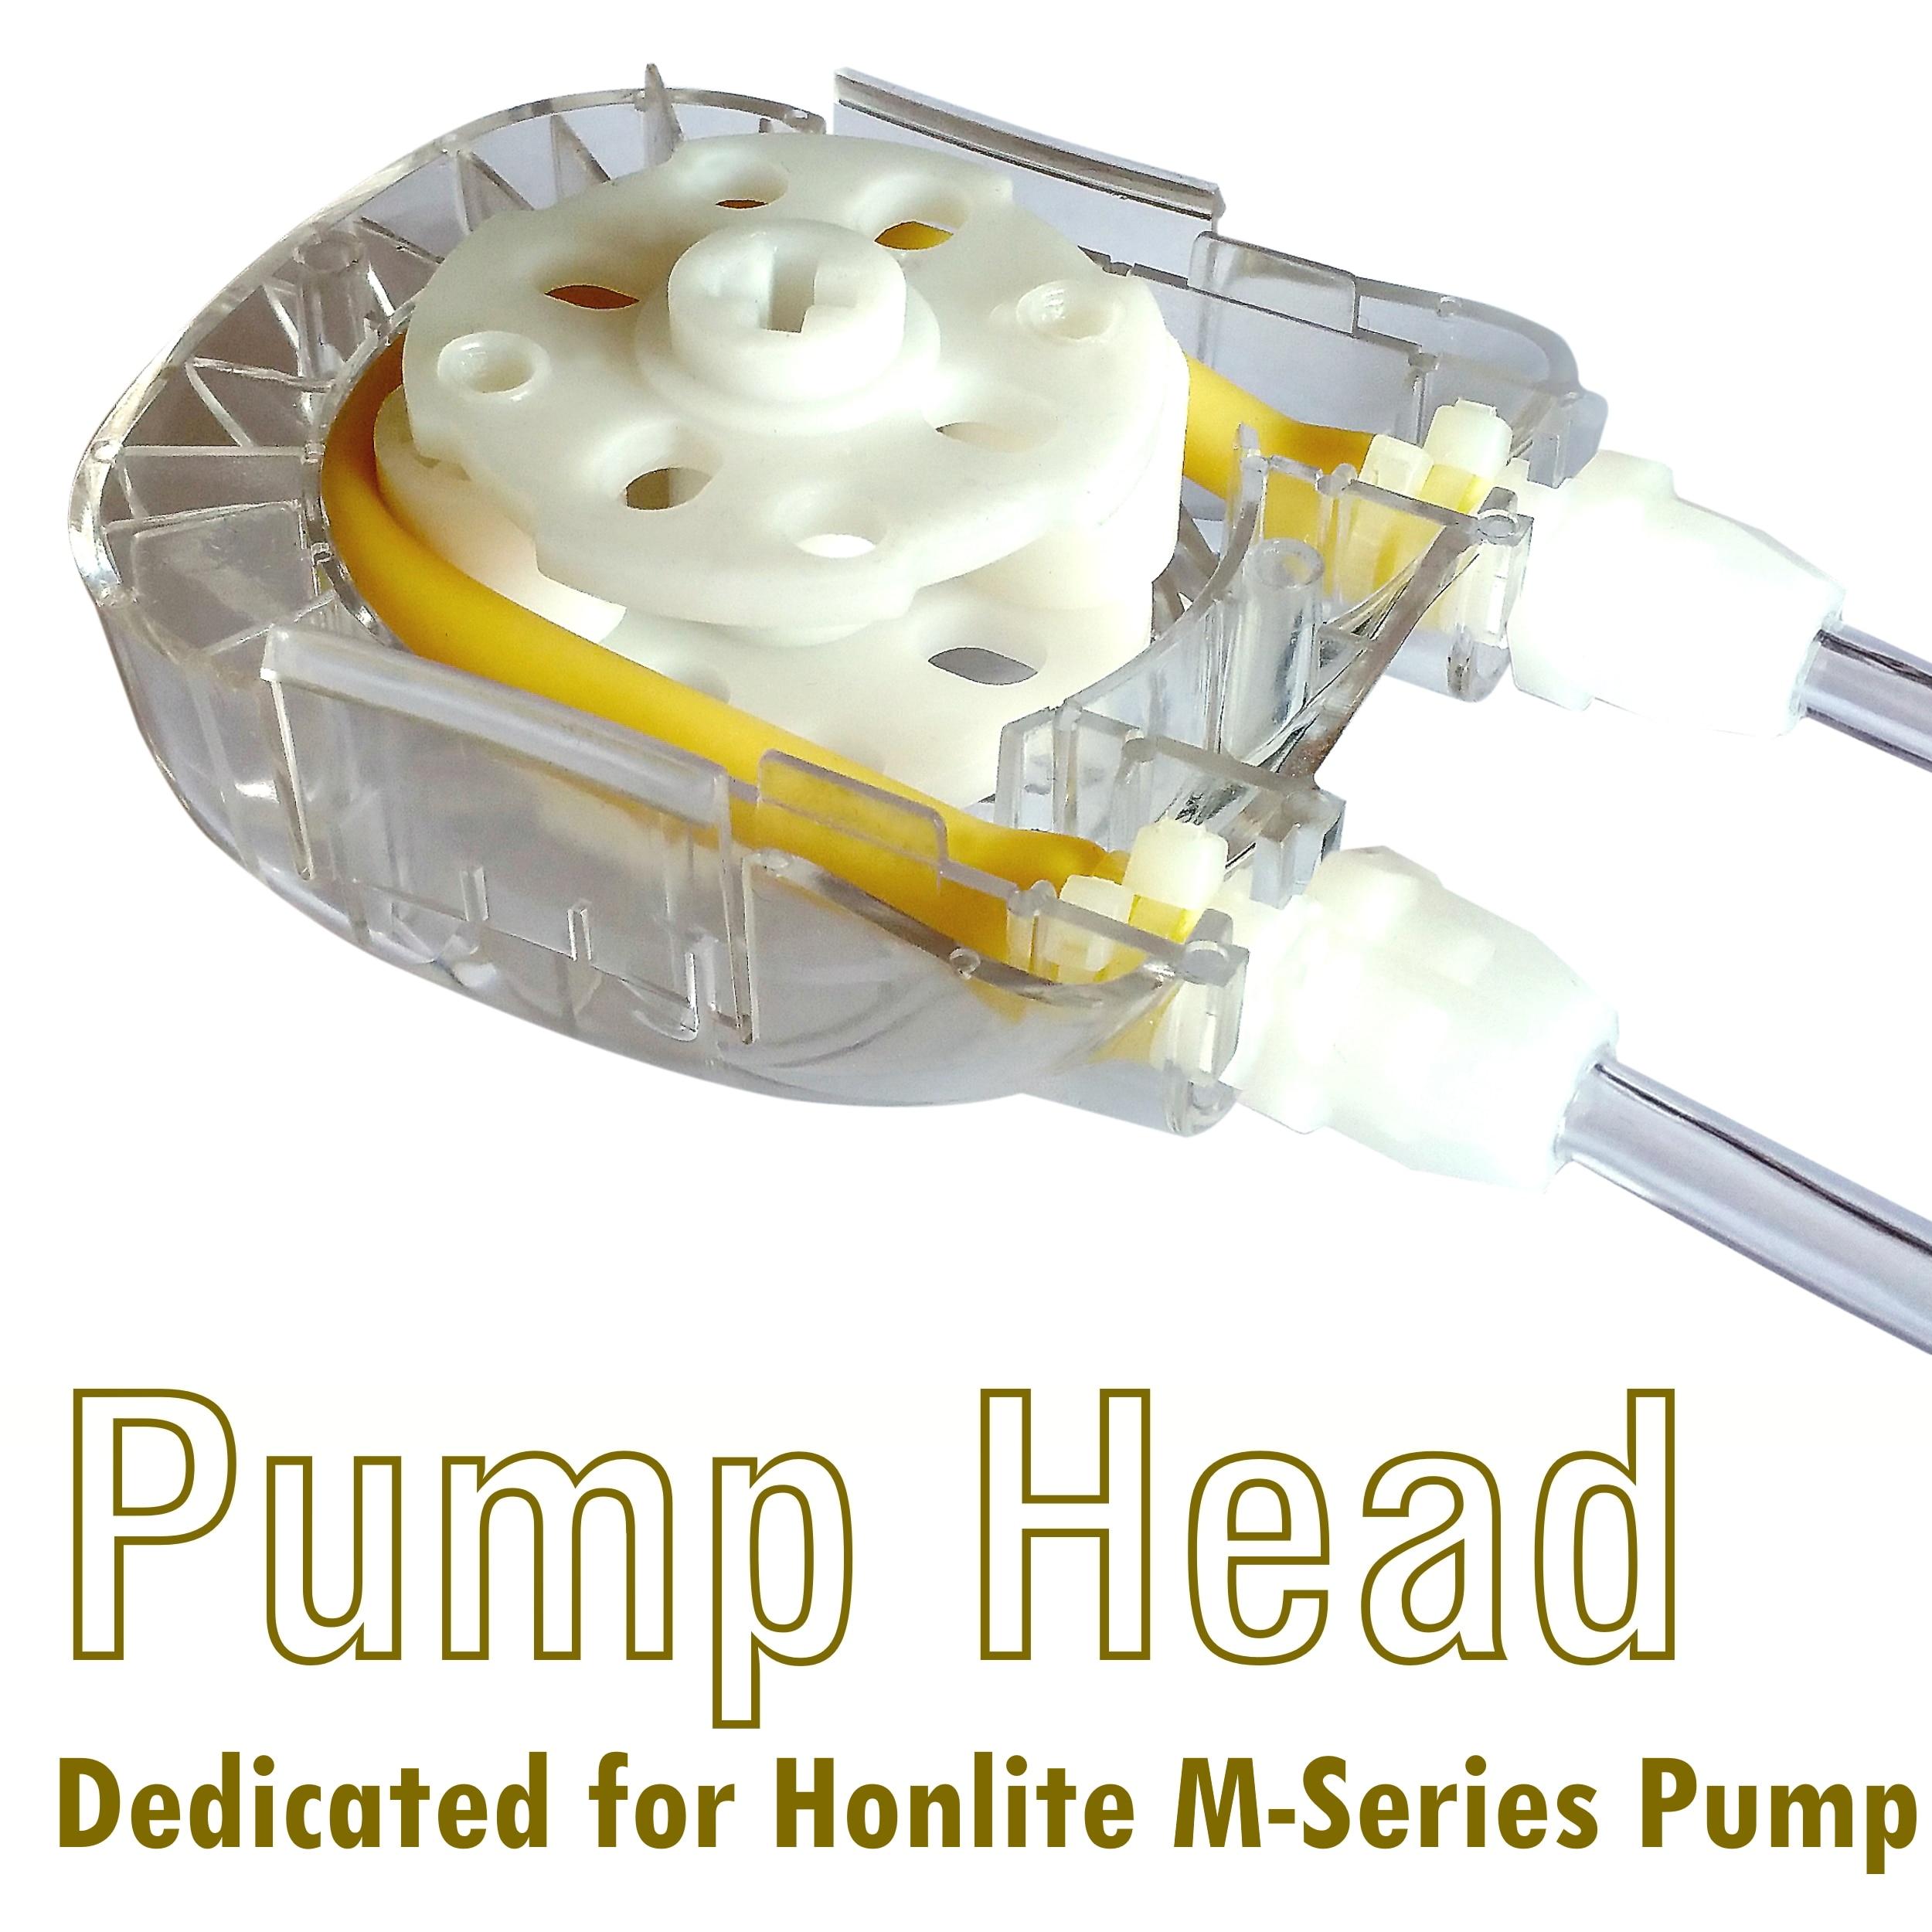 1500ml/min, 3 Rollers, Honlite M-Series Peristaltic Pump Head Assembly